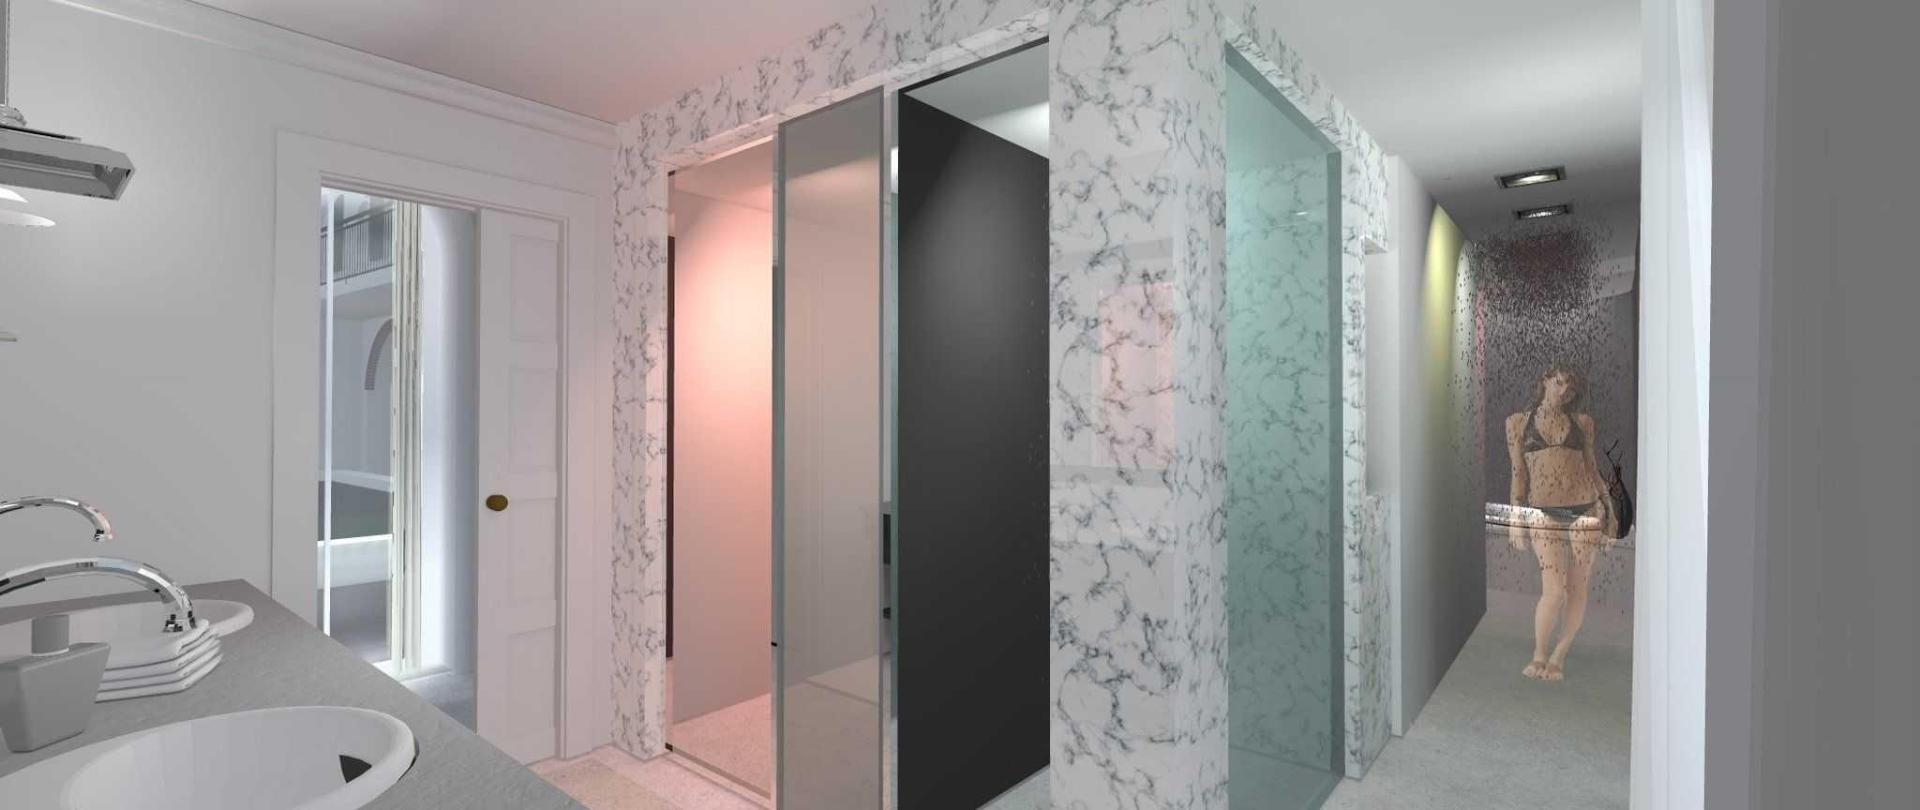 interno-bagno-suite-marialuisa.jpg